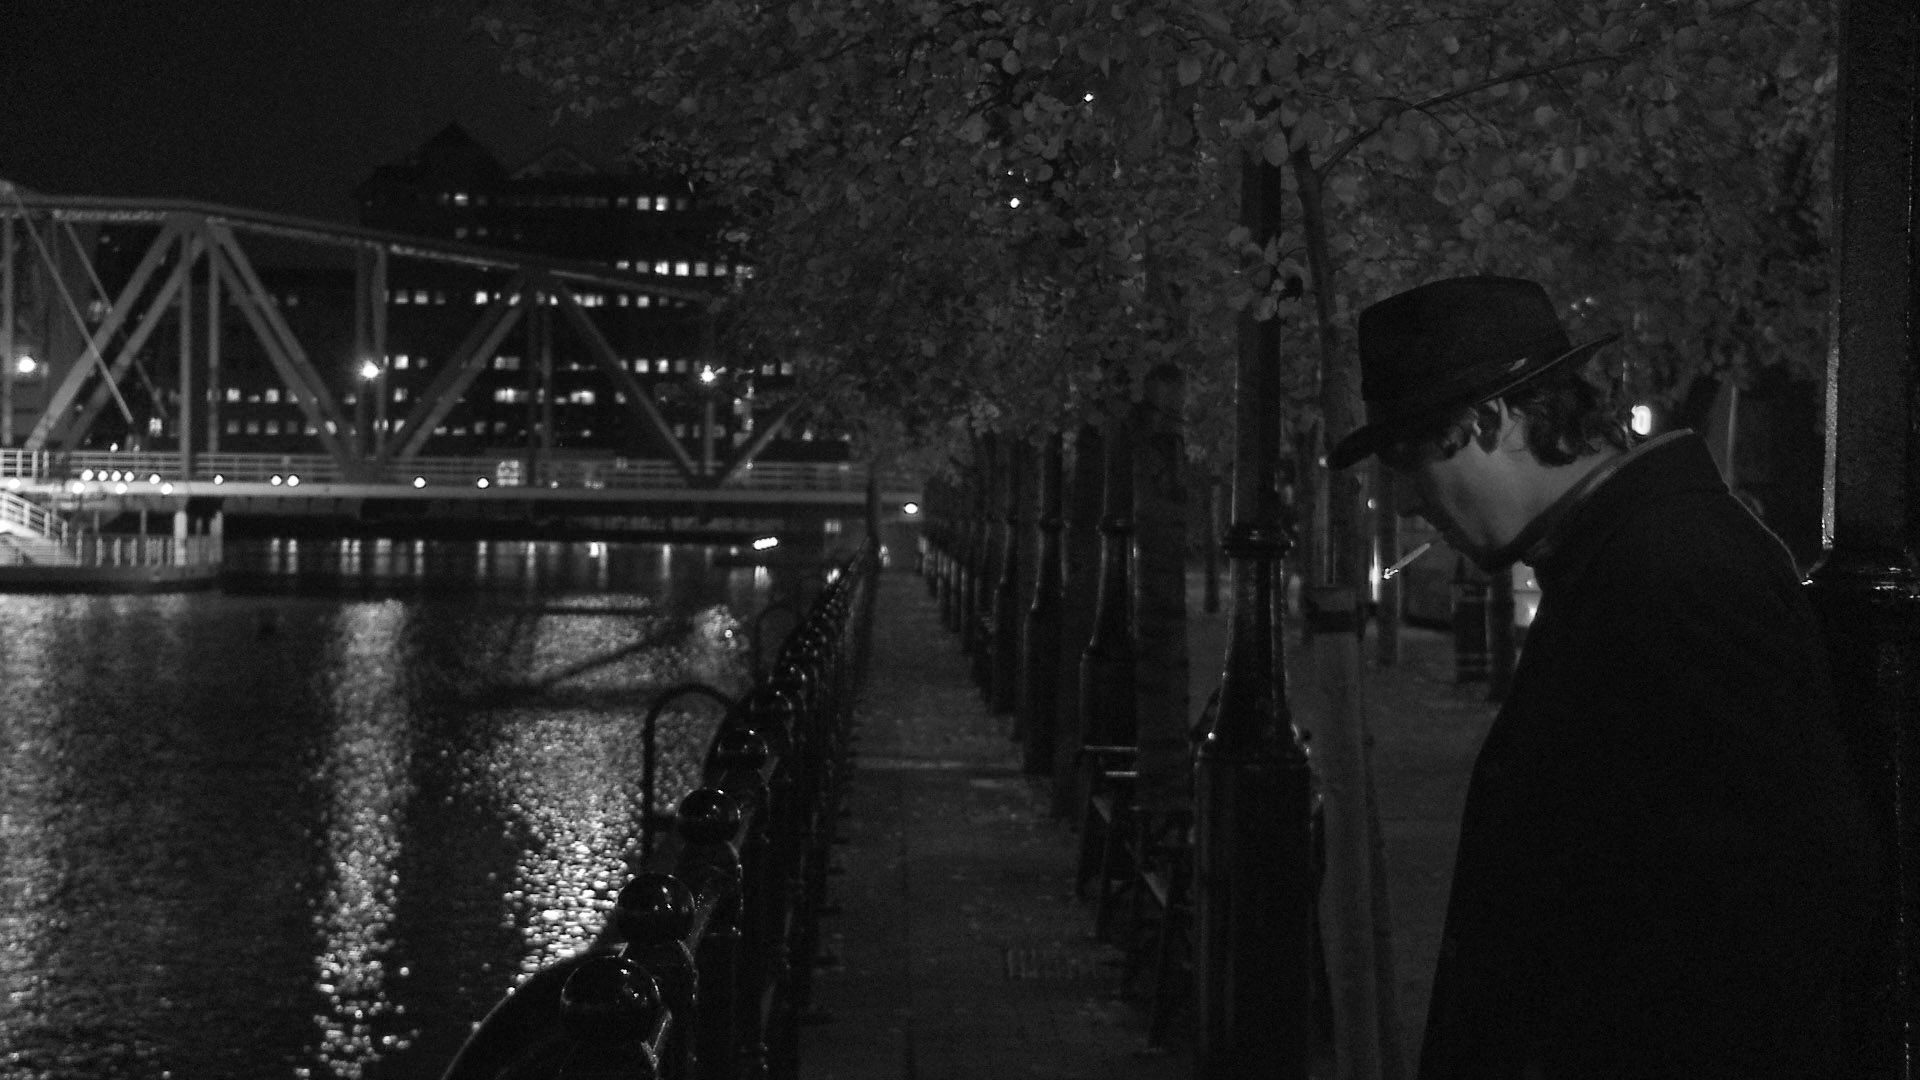 Film Noir Wallpaper It is a part of film noir 1920x1080